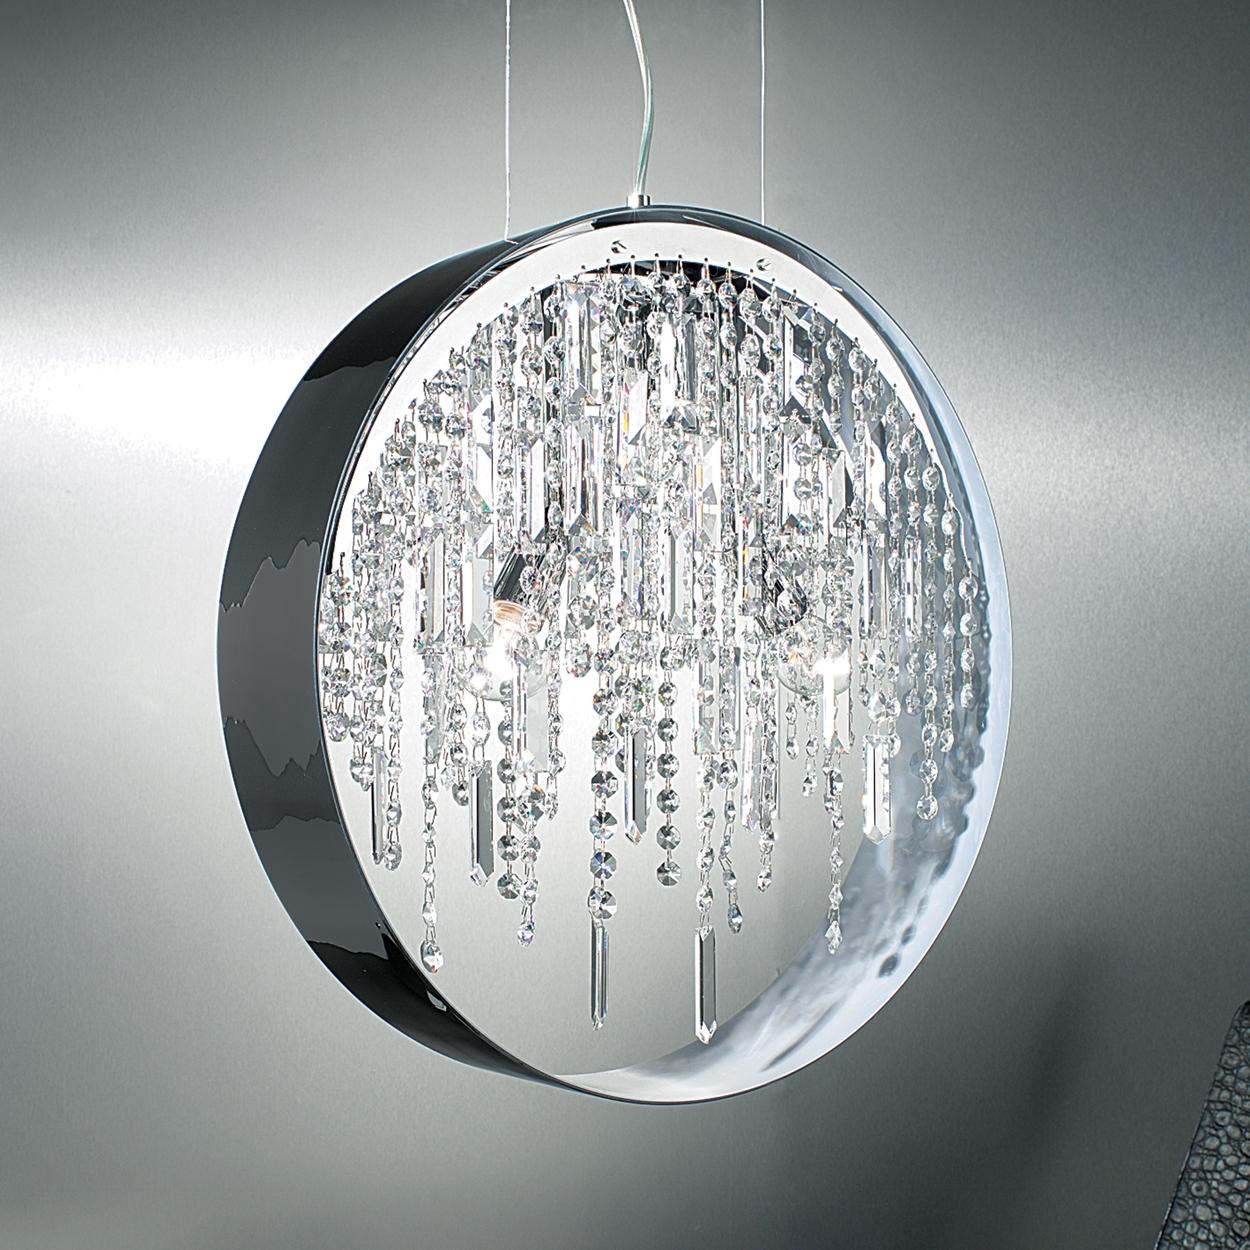 Stylish Modern Chandelier Lighting (View 5 of 15)